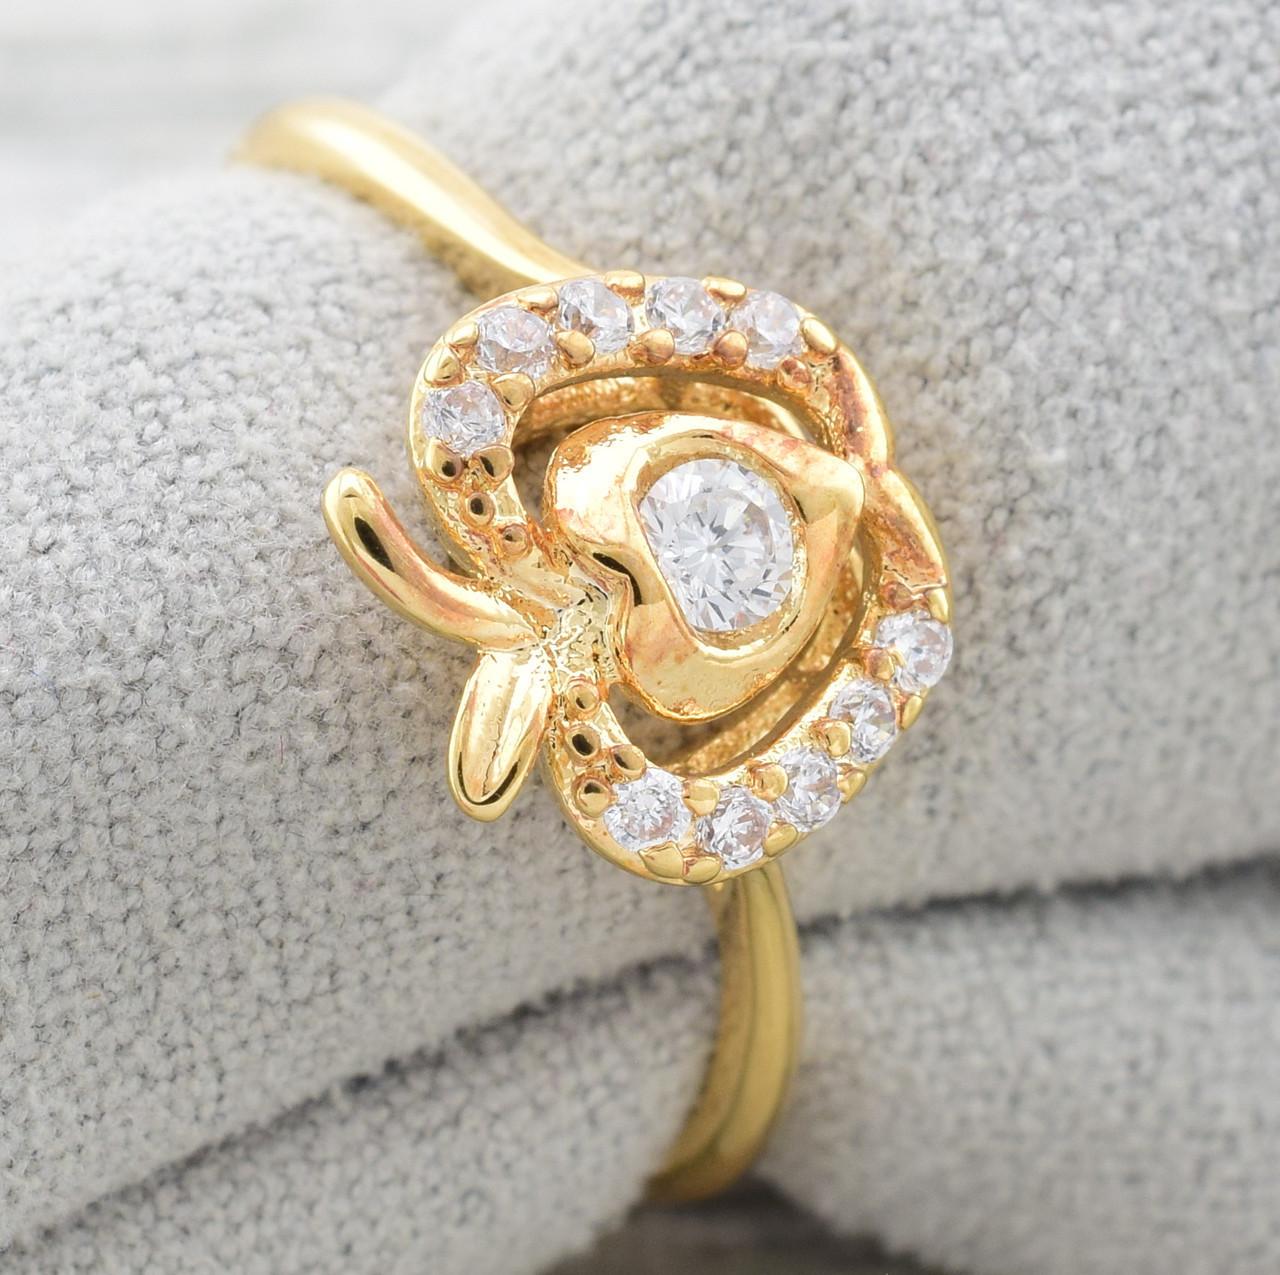 Кольцо Xuping 11873 размер 20 ширина 8 мм куб.цирконий вес 1.7 г позолота 18К